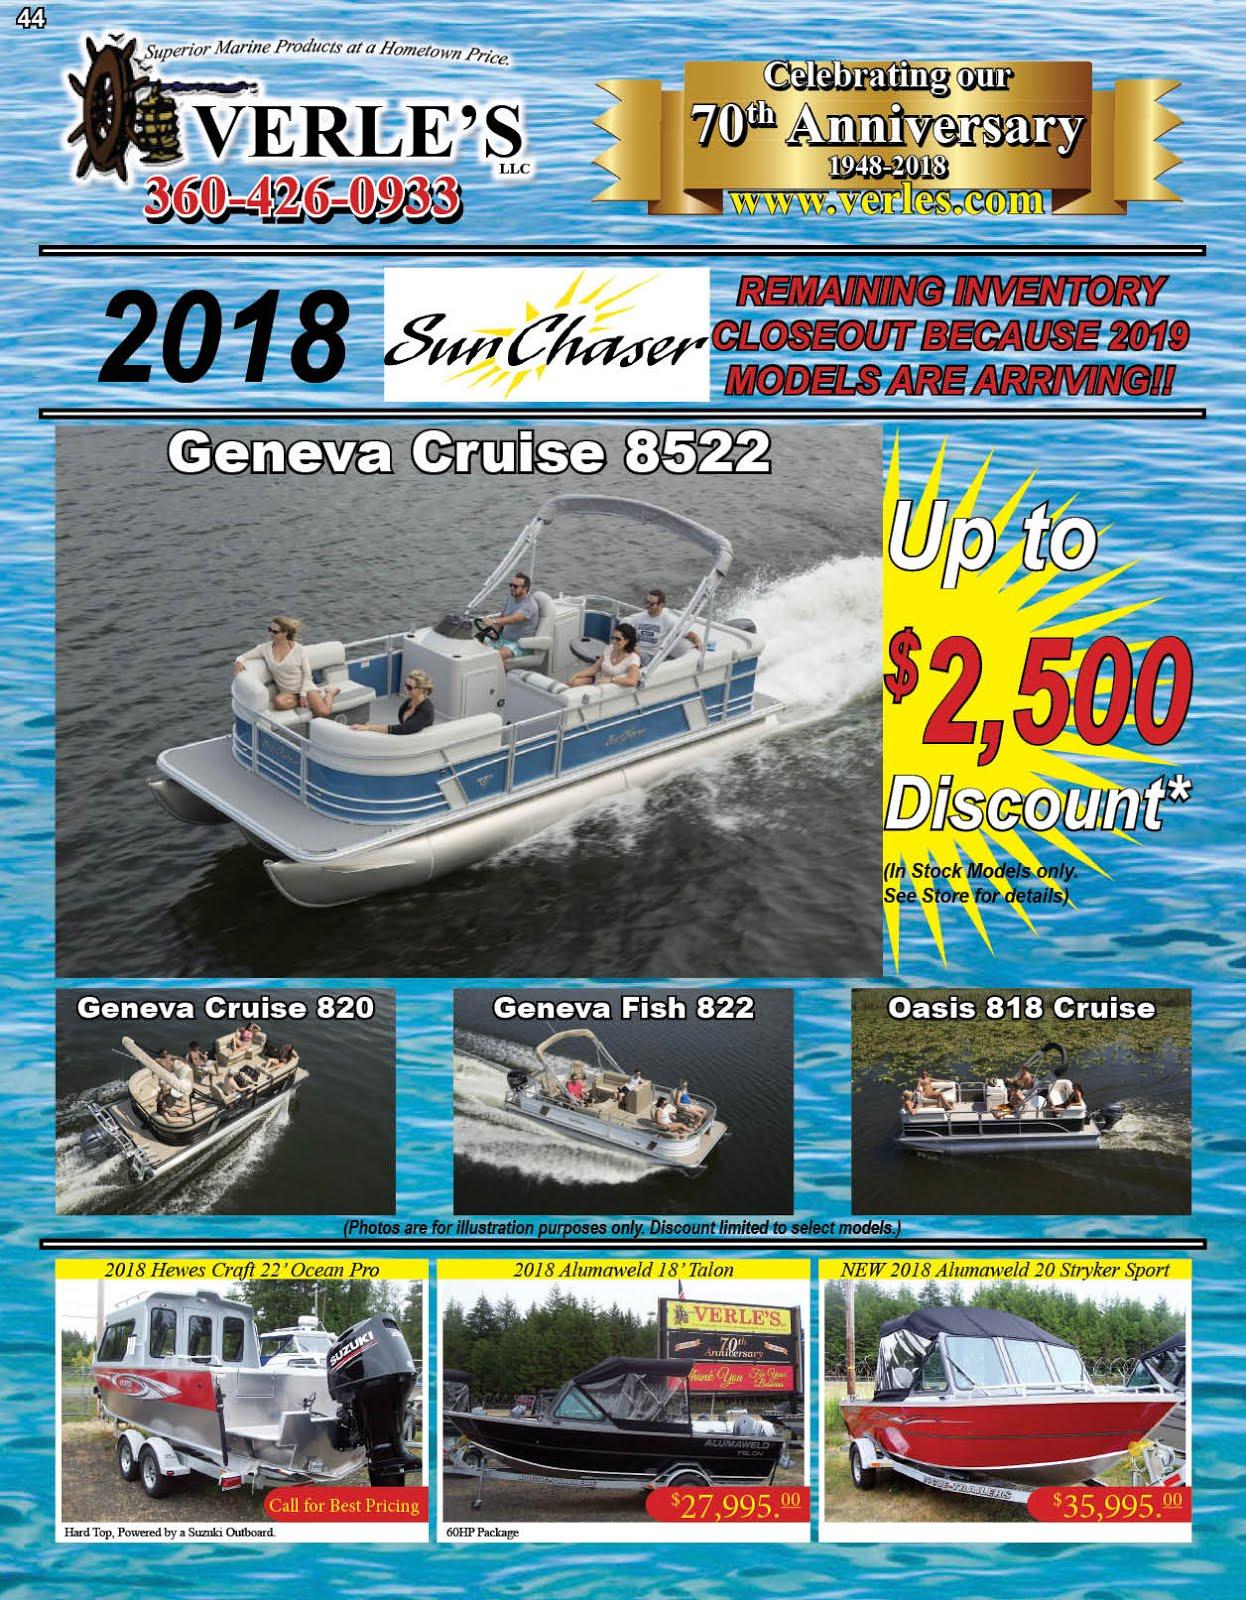 Verles 70th Anniversary!! Specials On Boats Marine Gear Tackle Guns Ammo!!